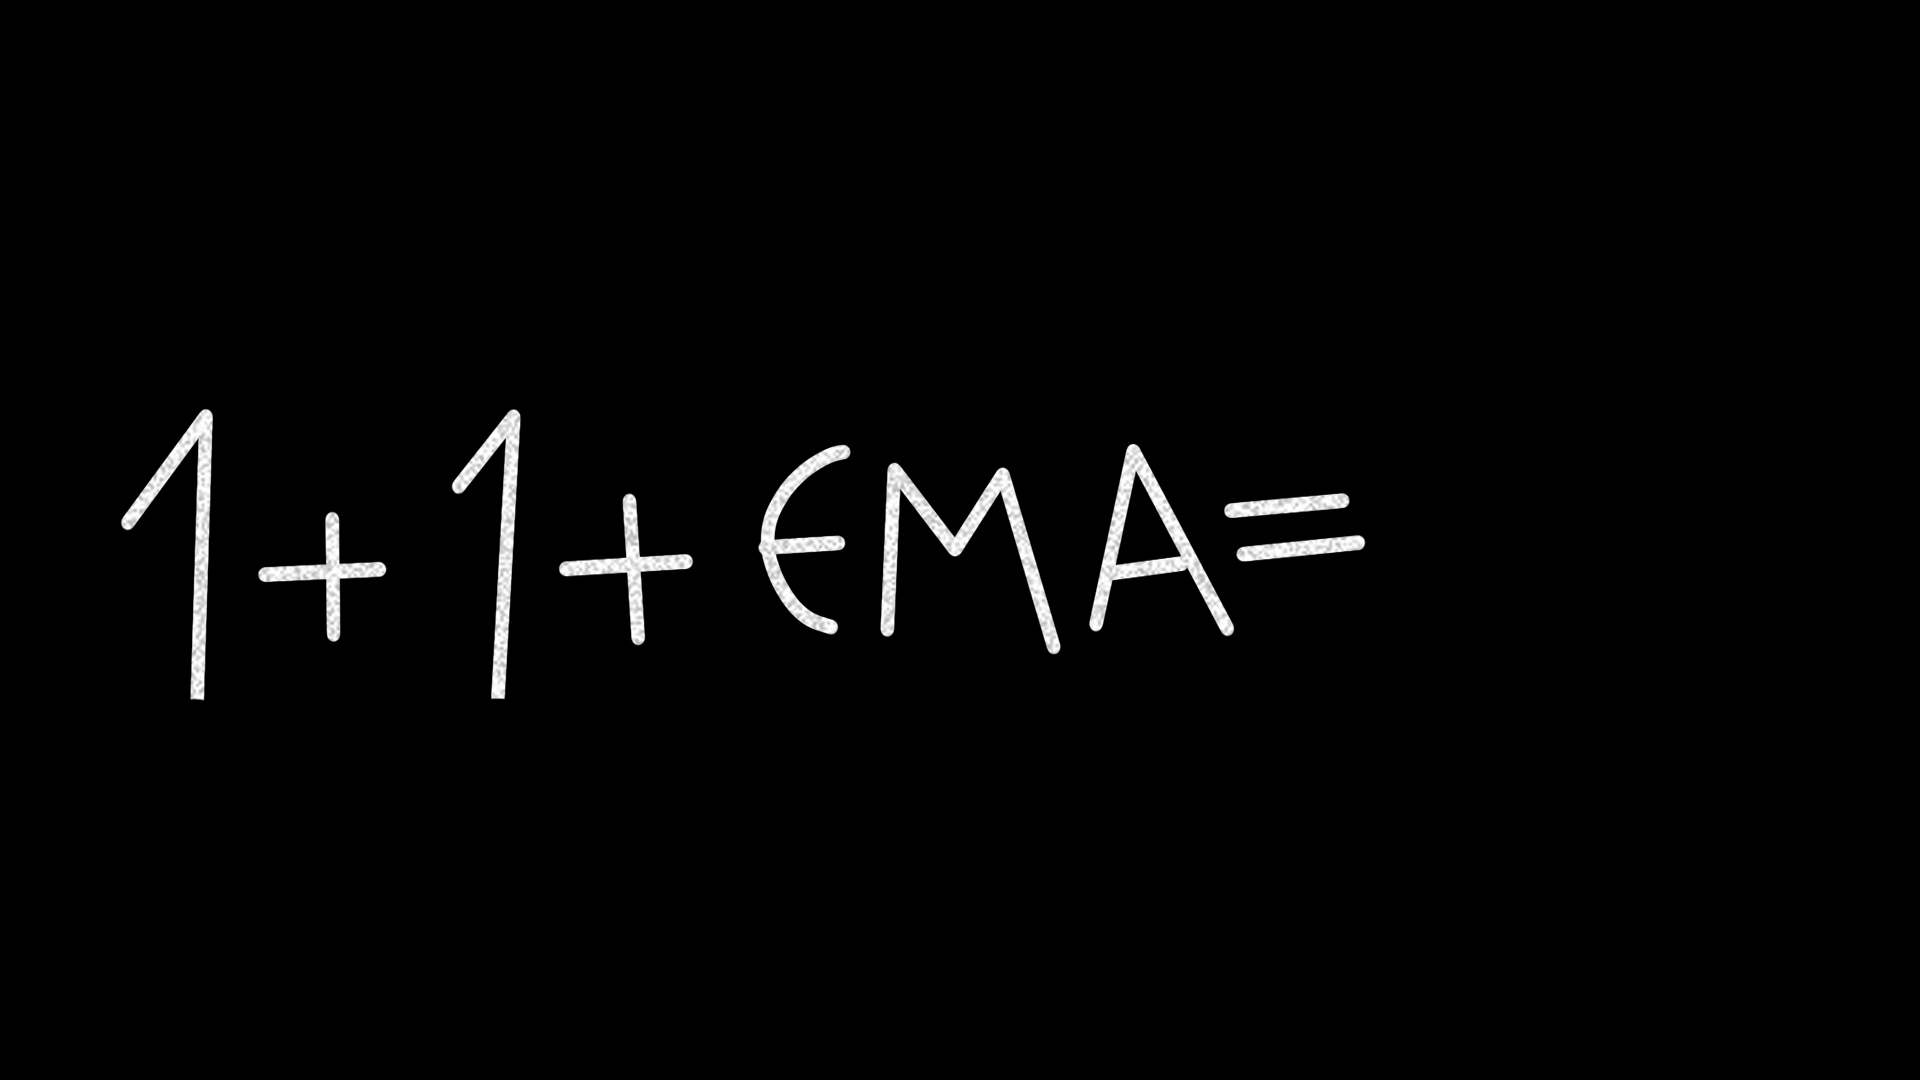 1+1_EMA